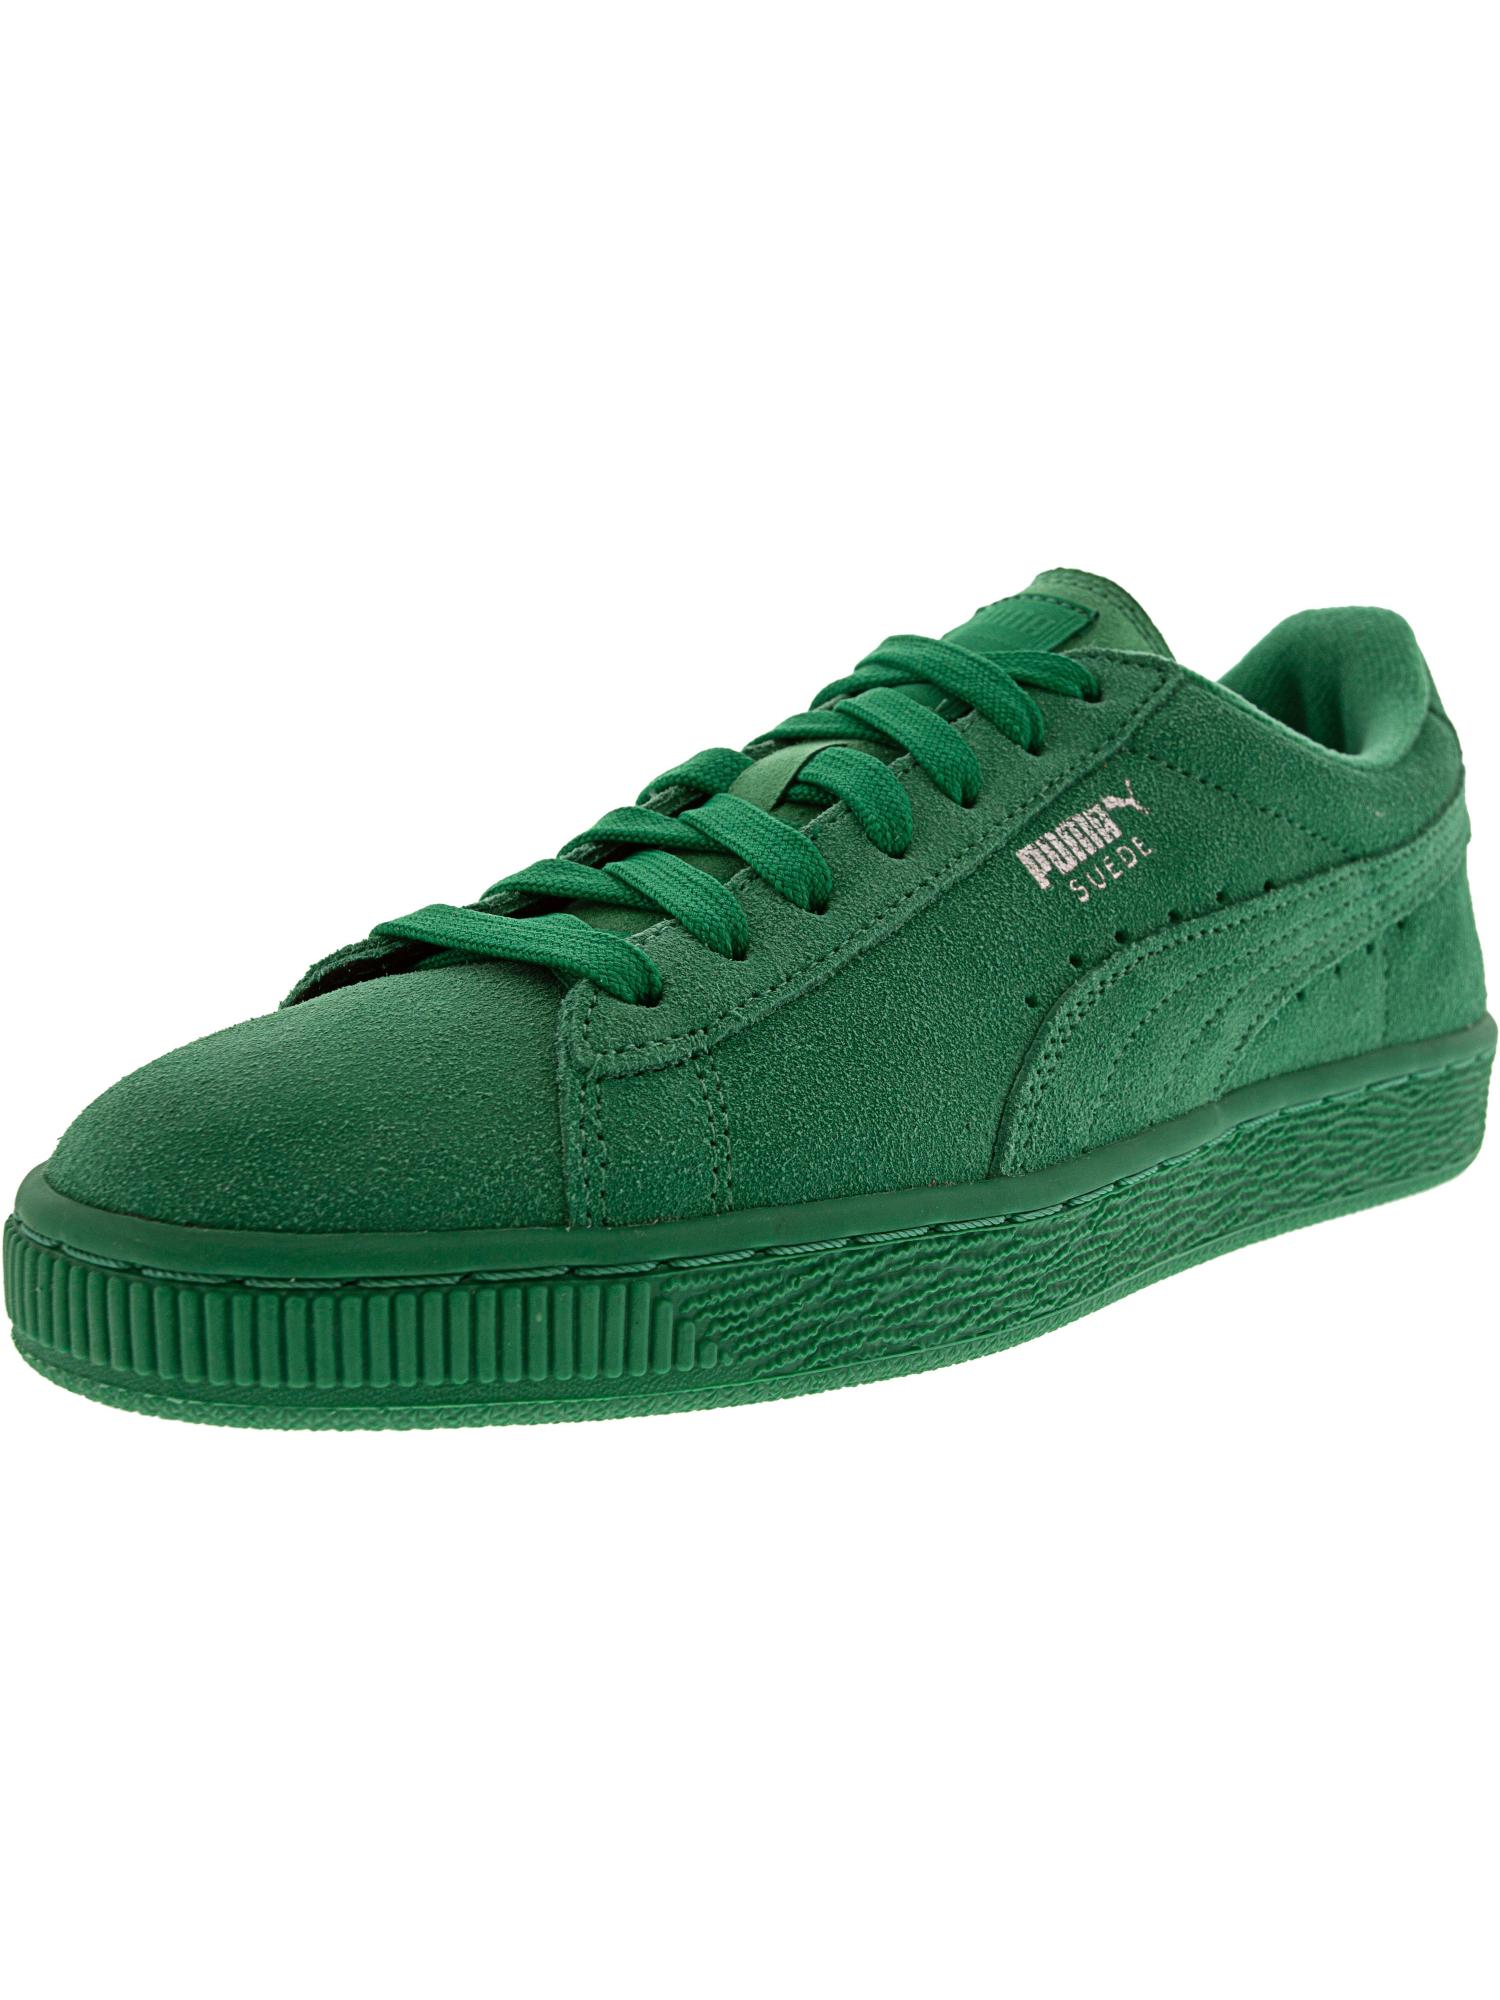 dc2d36b413c7 Puma-Suede-Jr-Ankle-High-Fashion-Sneaker thumbnail 4